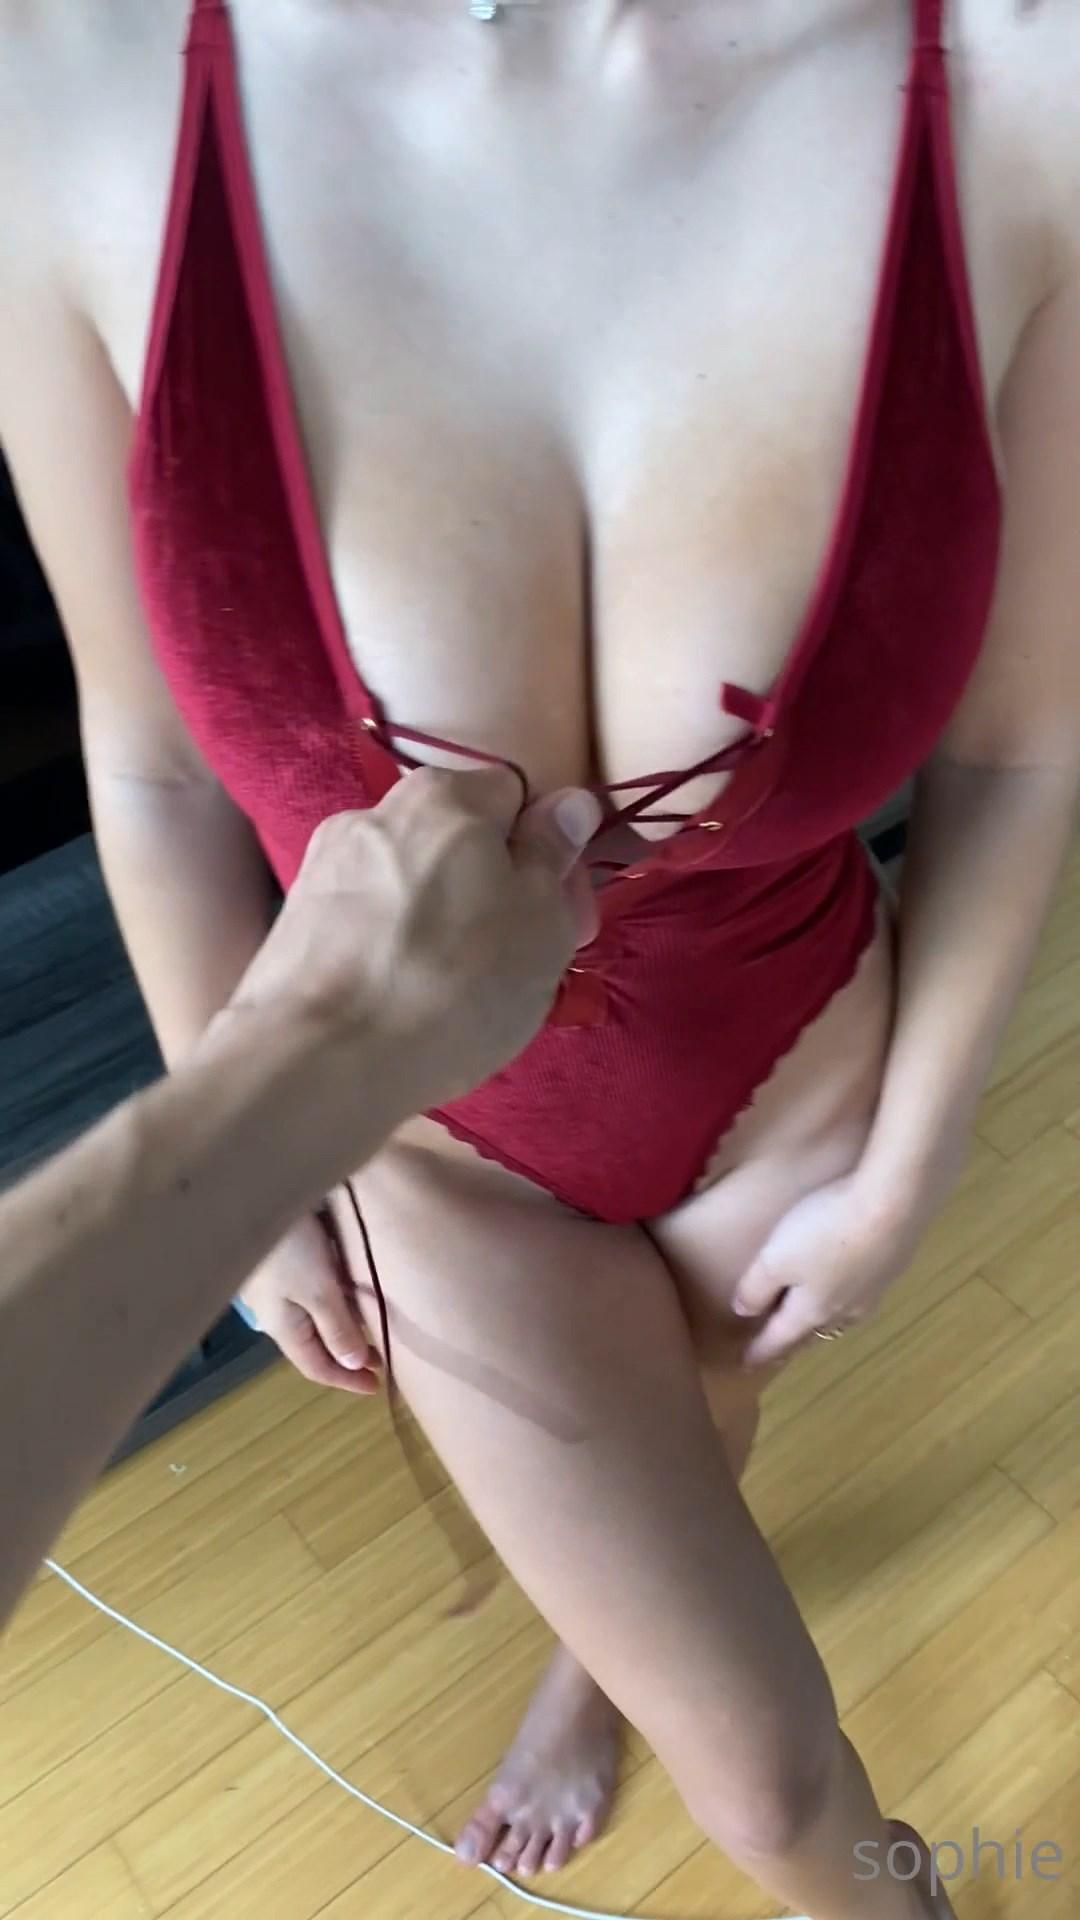 Sophie Mudd Lingerie Boob Grab Onlyfans Video Leaked Yplmtw